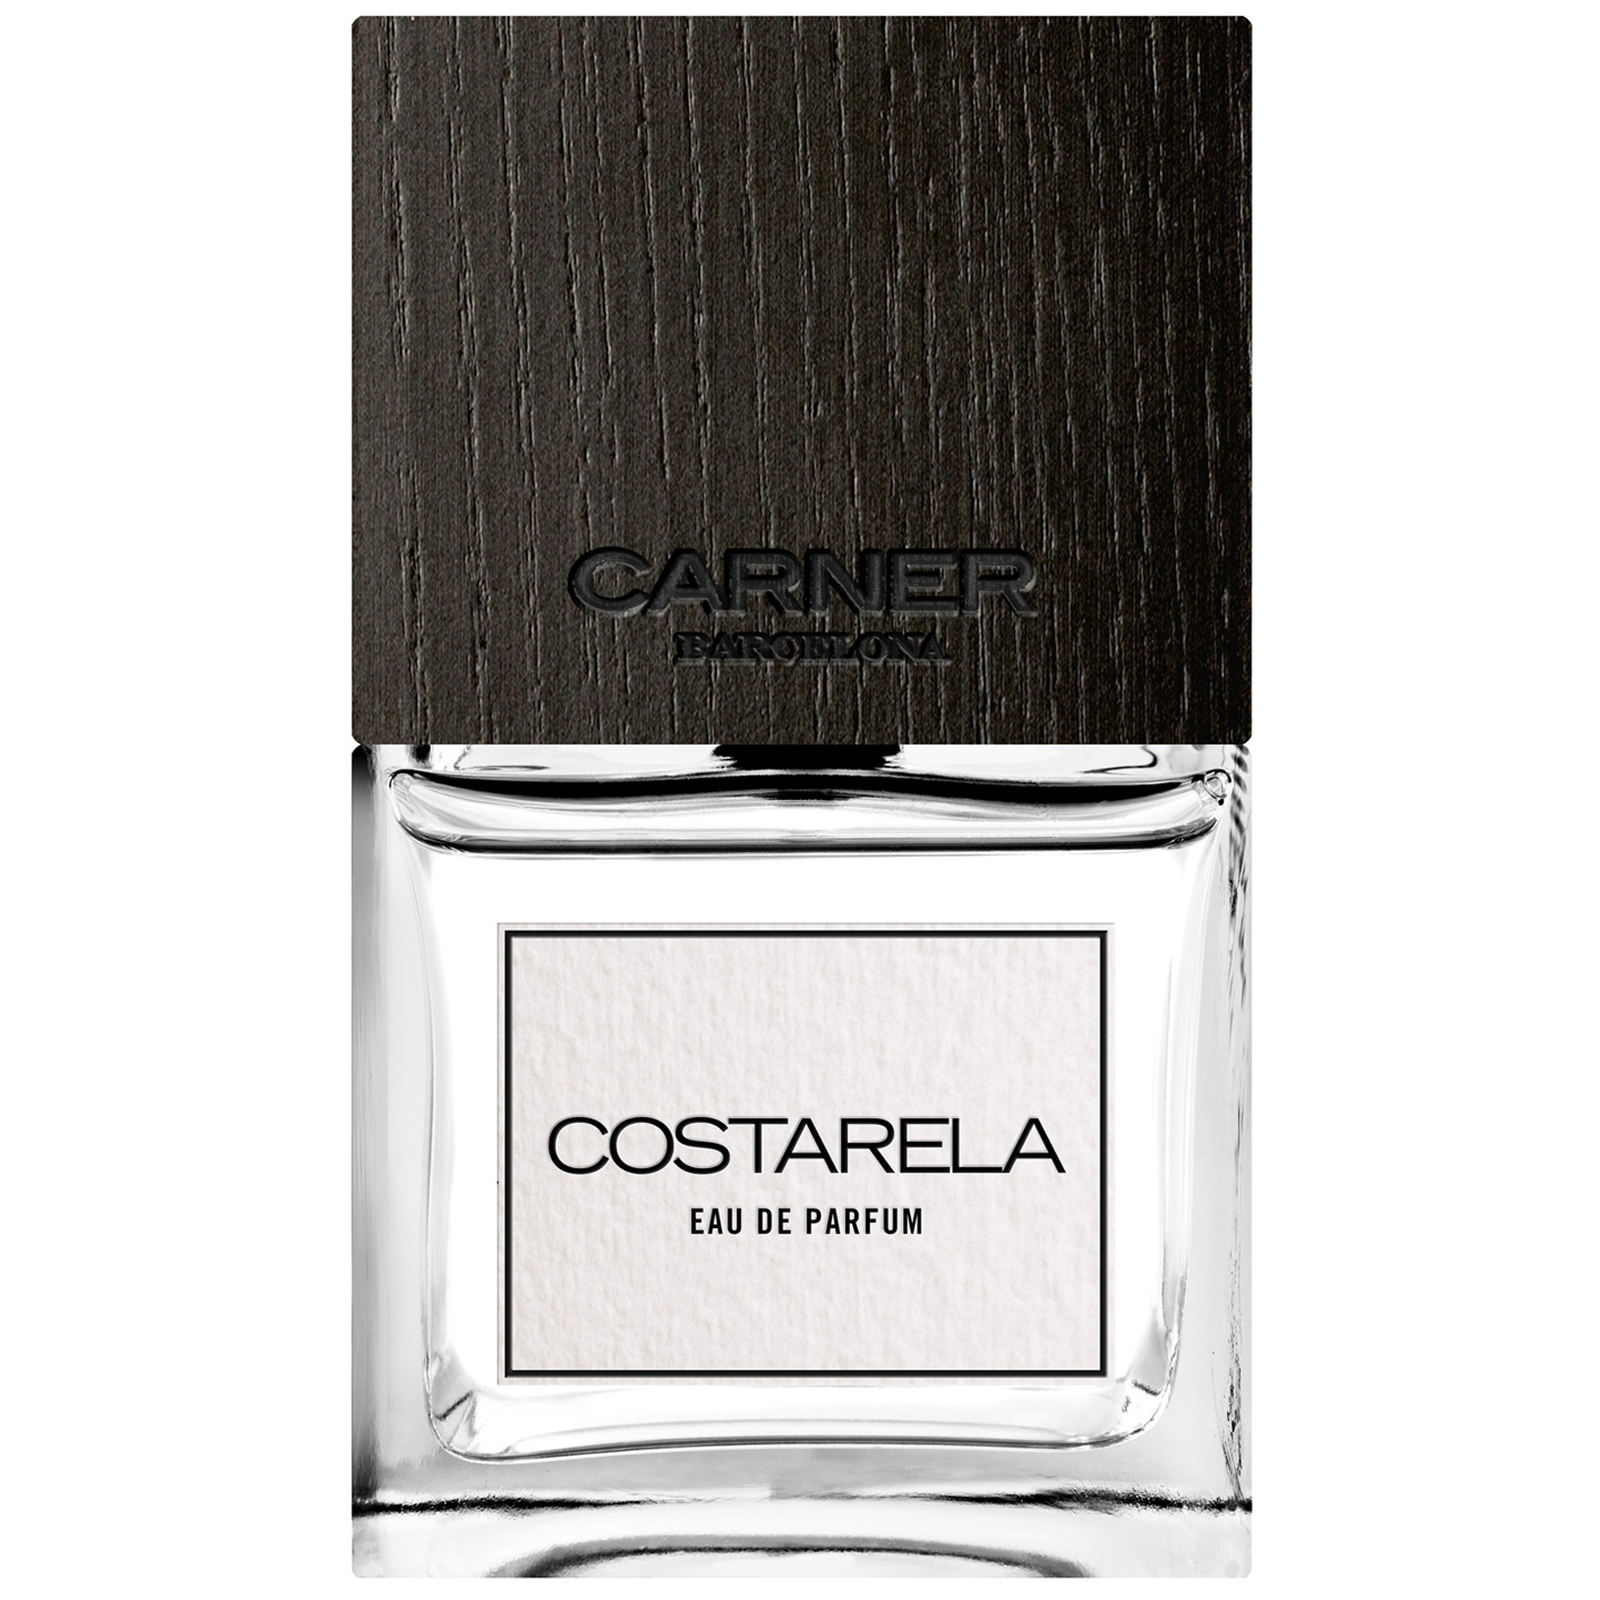 Costarela profumo eau de parfum 100 ml